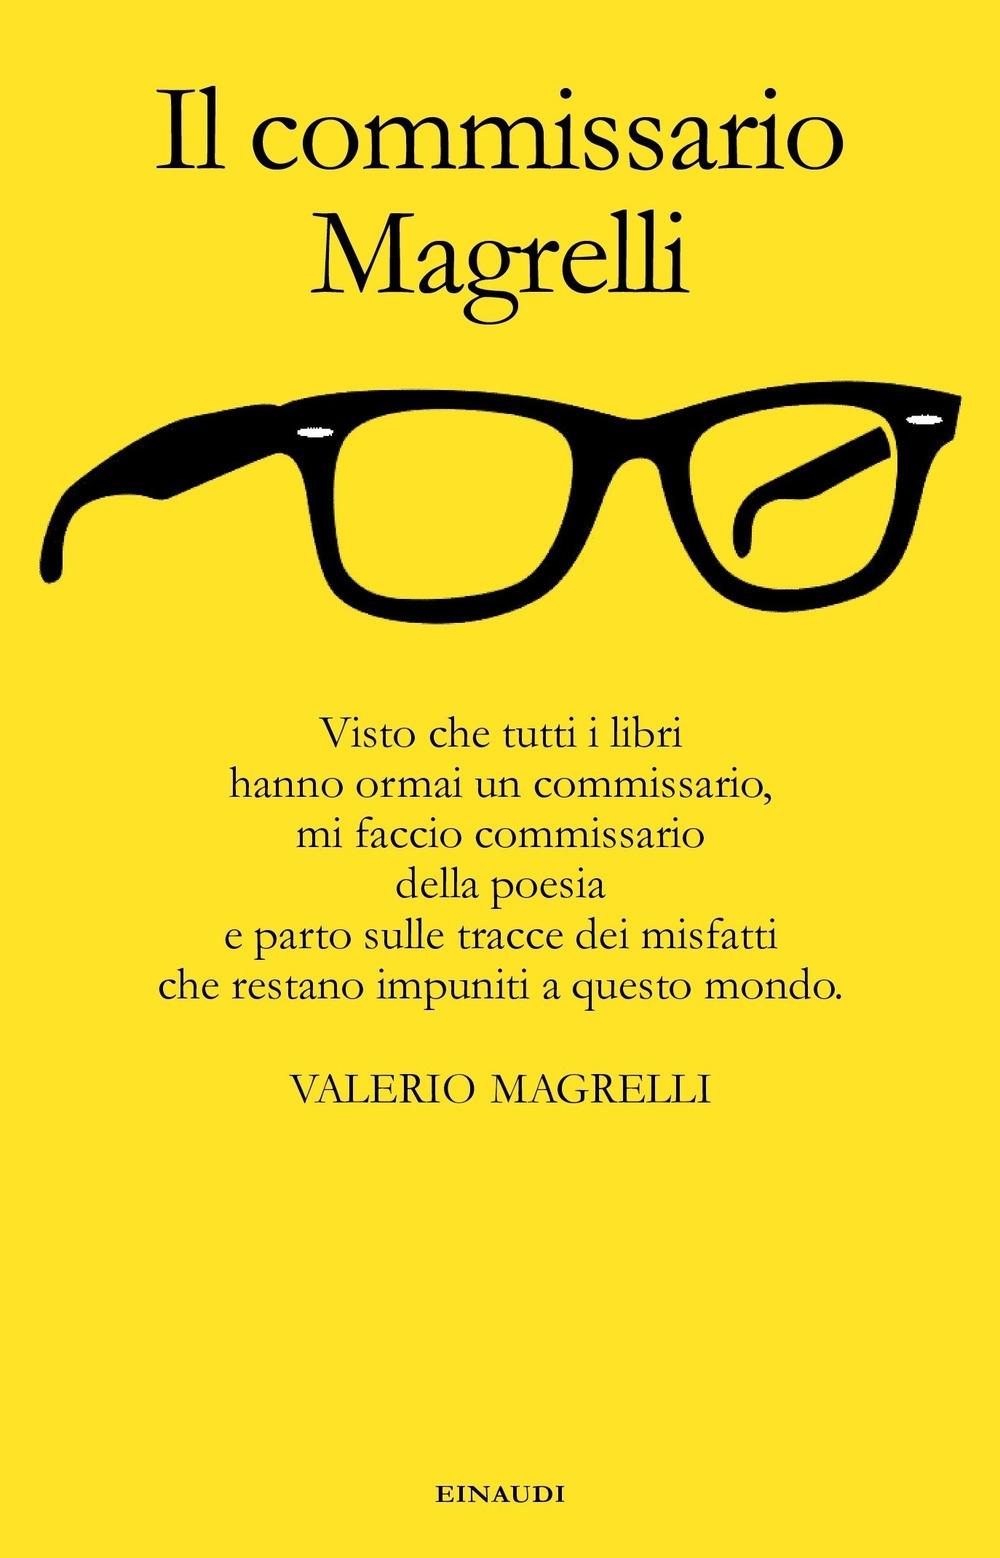 Il commissario Magrelli